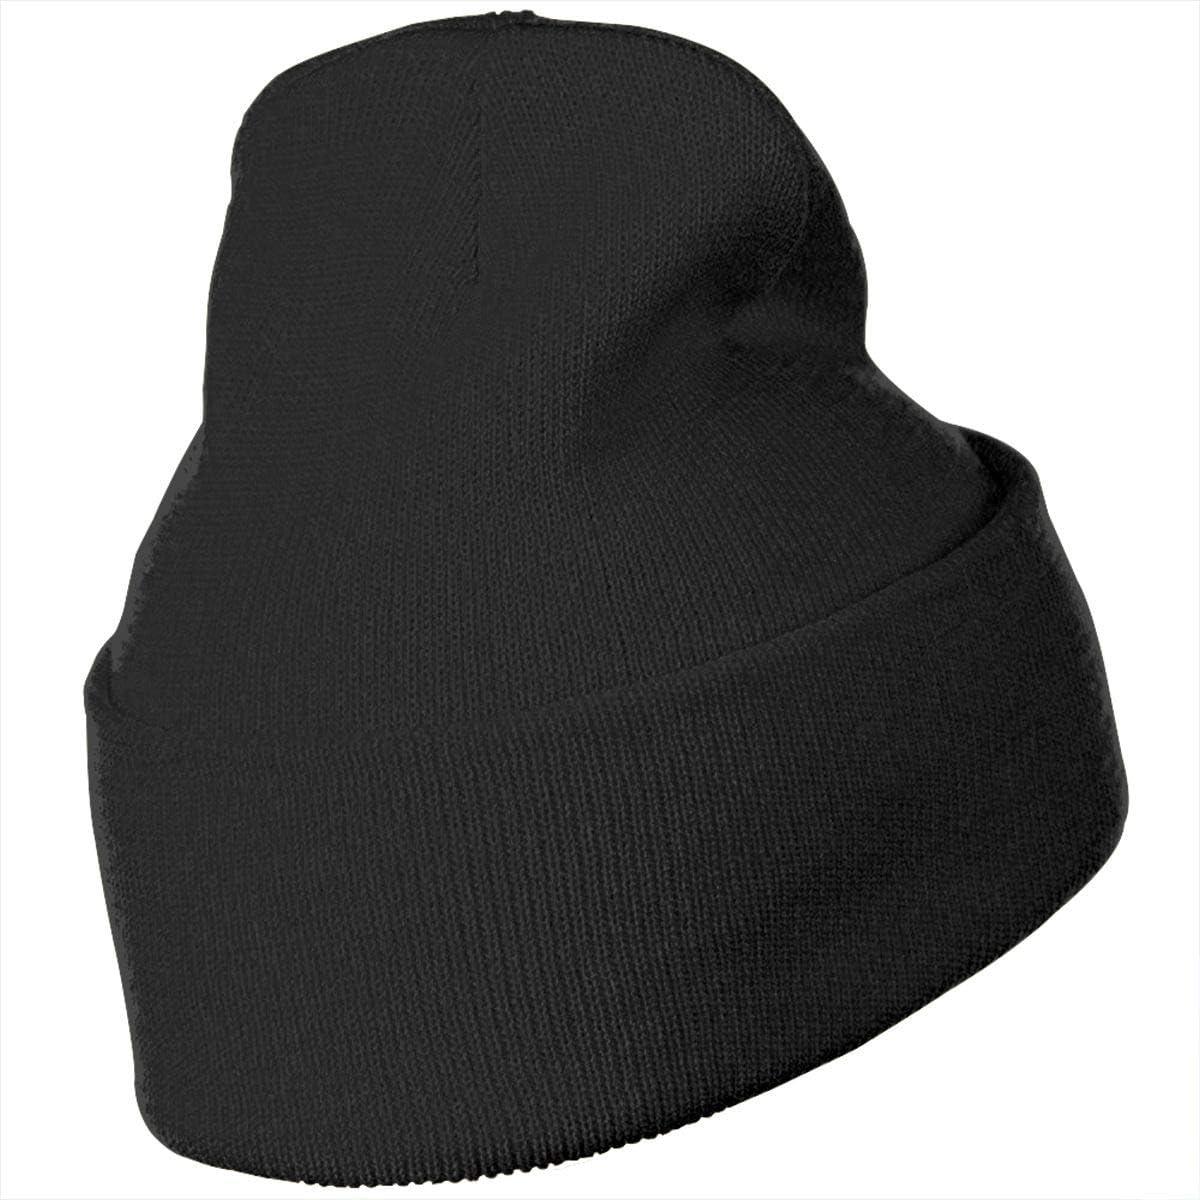 QZqDQ Blue Yellow Fashion Unisex Fashion Knitted Hat Luxury Hip-Hop Cap